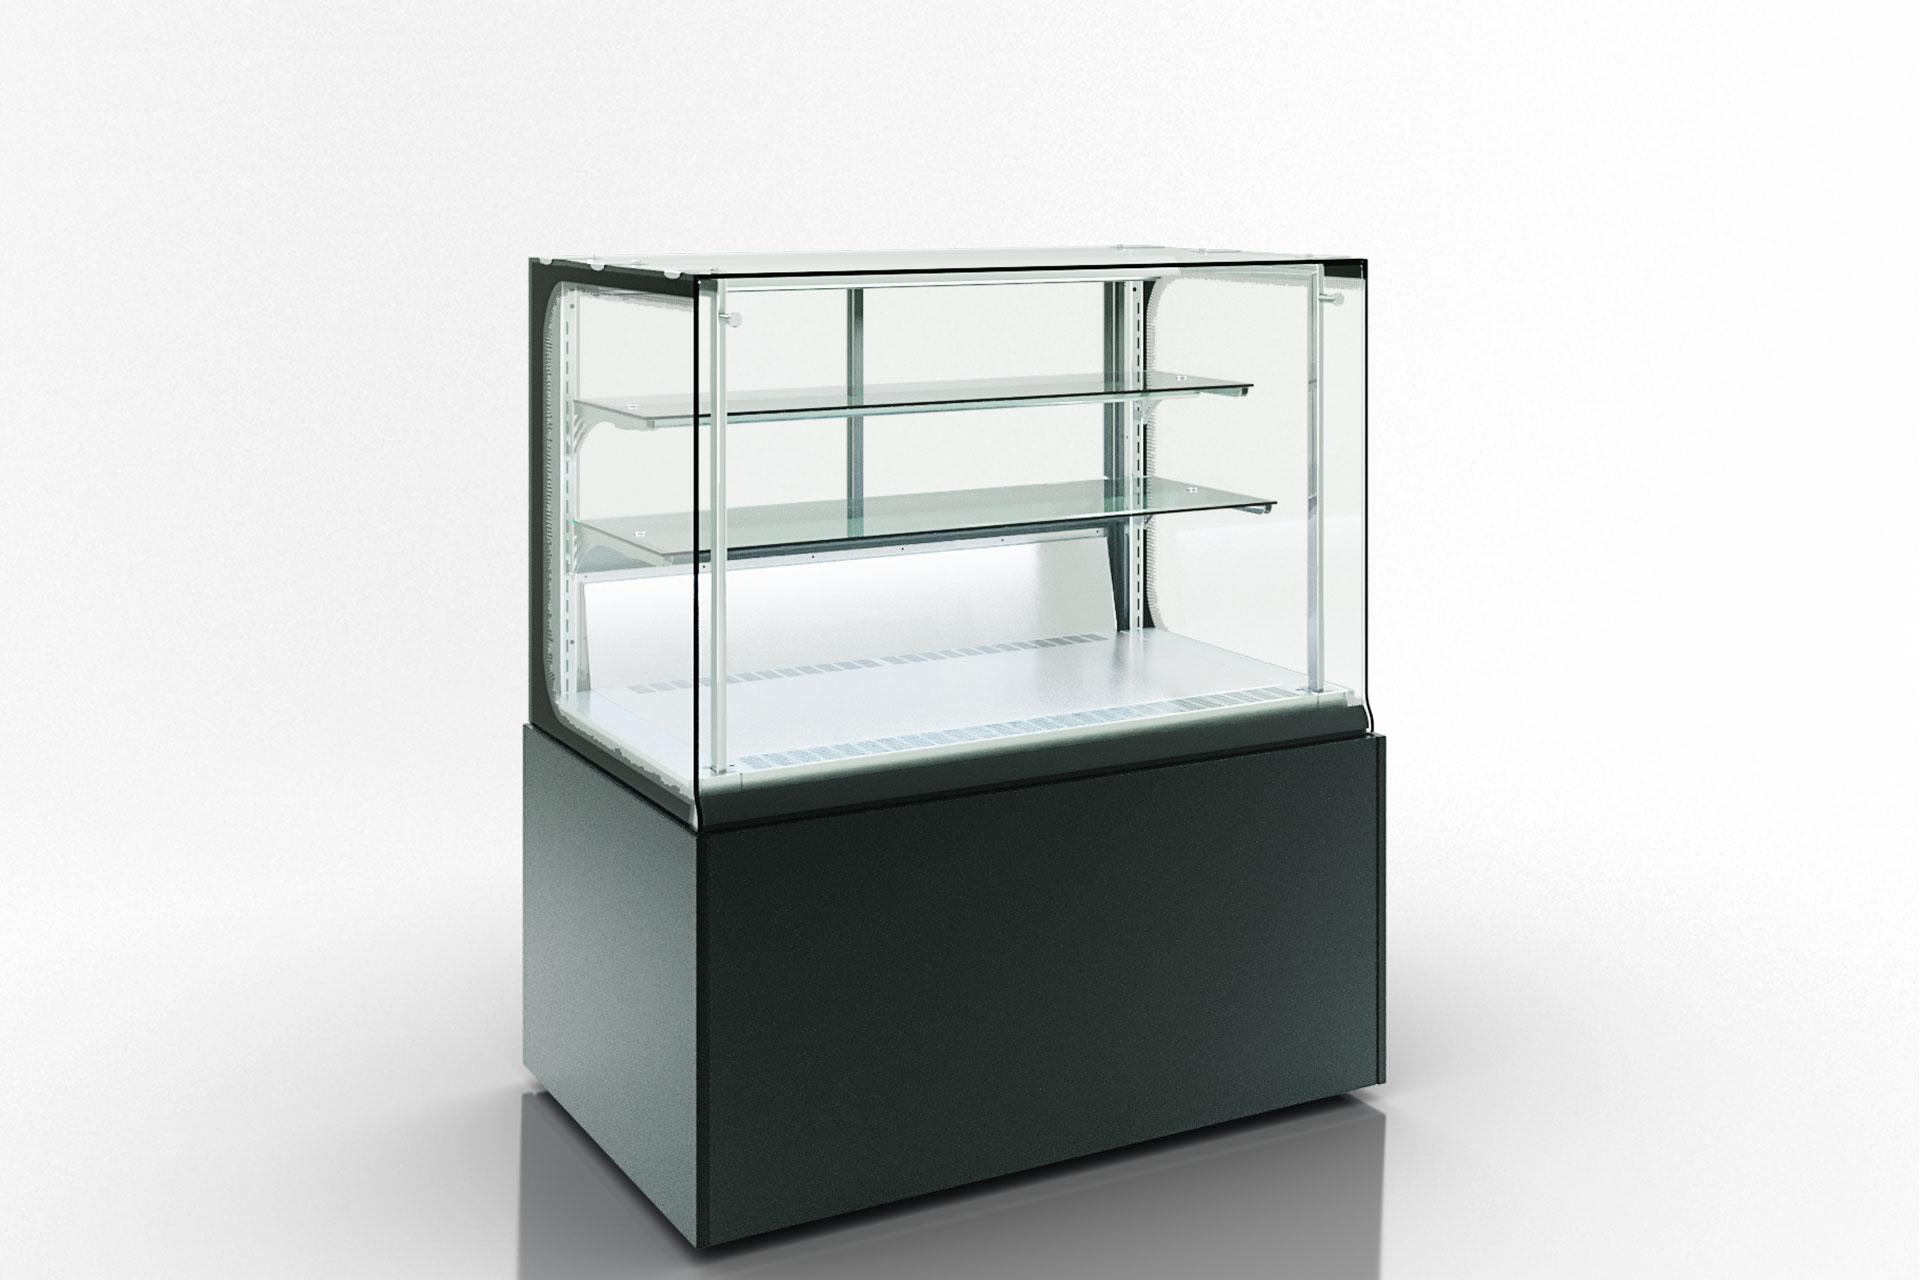 Confectionery counter Dakota VP AC 085 patisserie OS 150-DLA